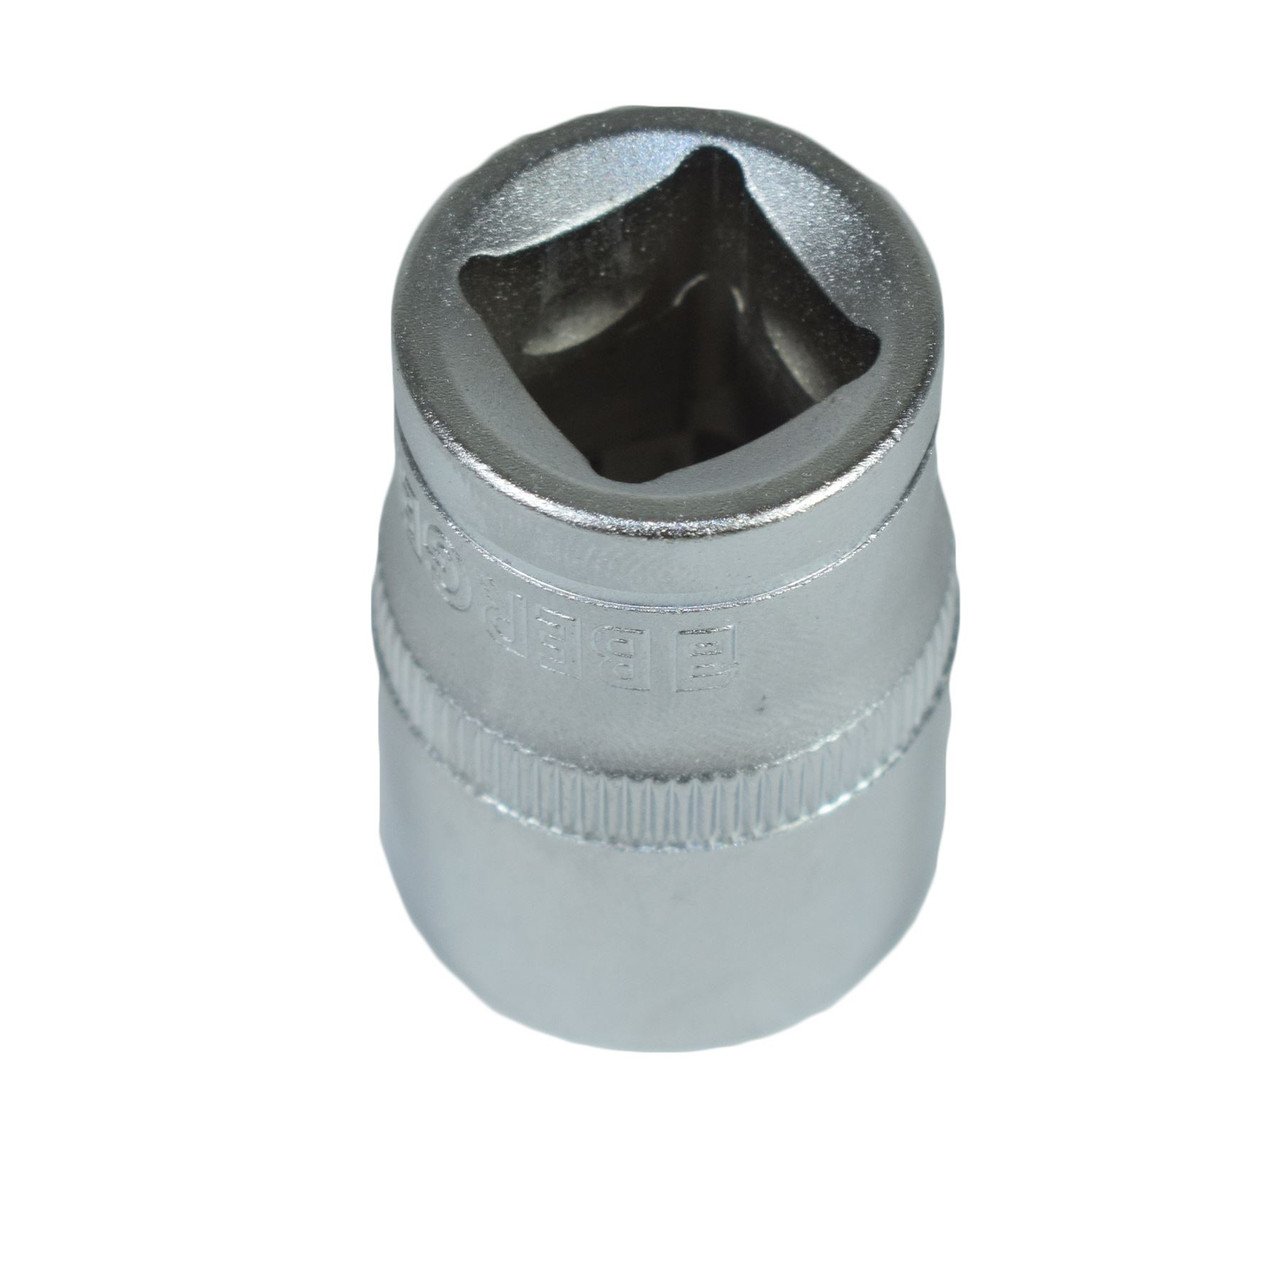 "1/2"" Drive 19mm Metric Super Lock Shallow 6-Sided Single Hex Socket Bergen"